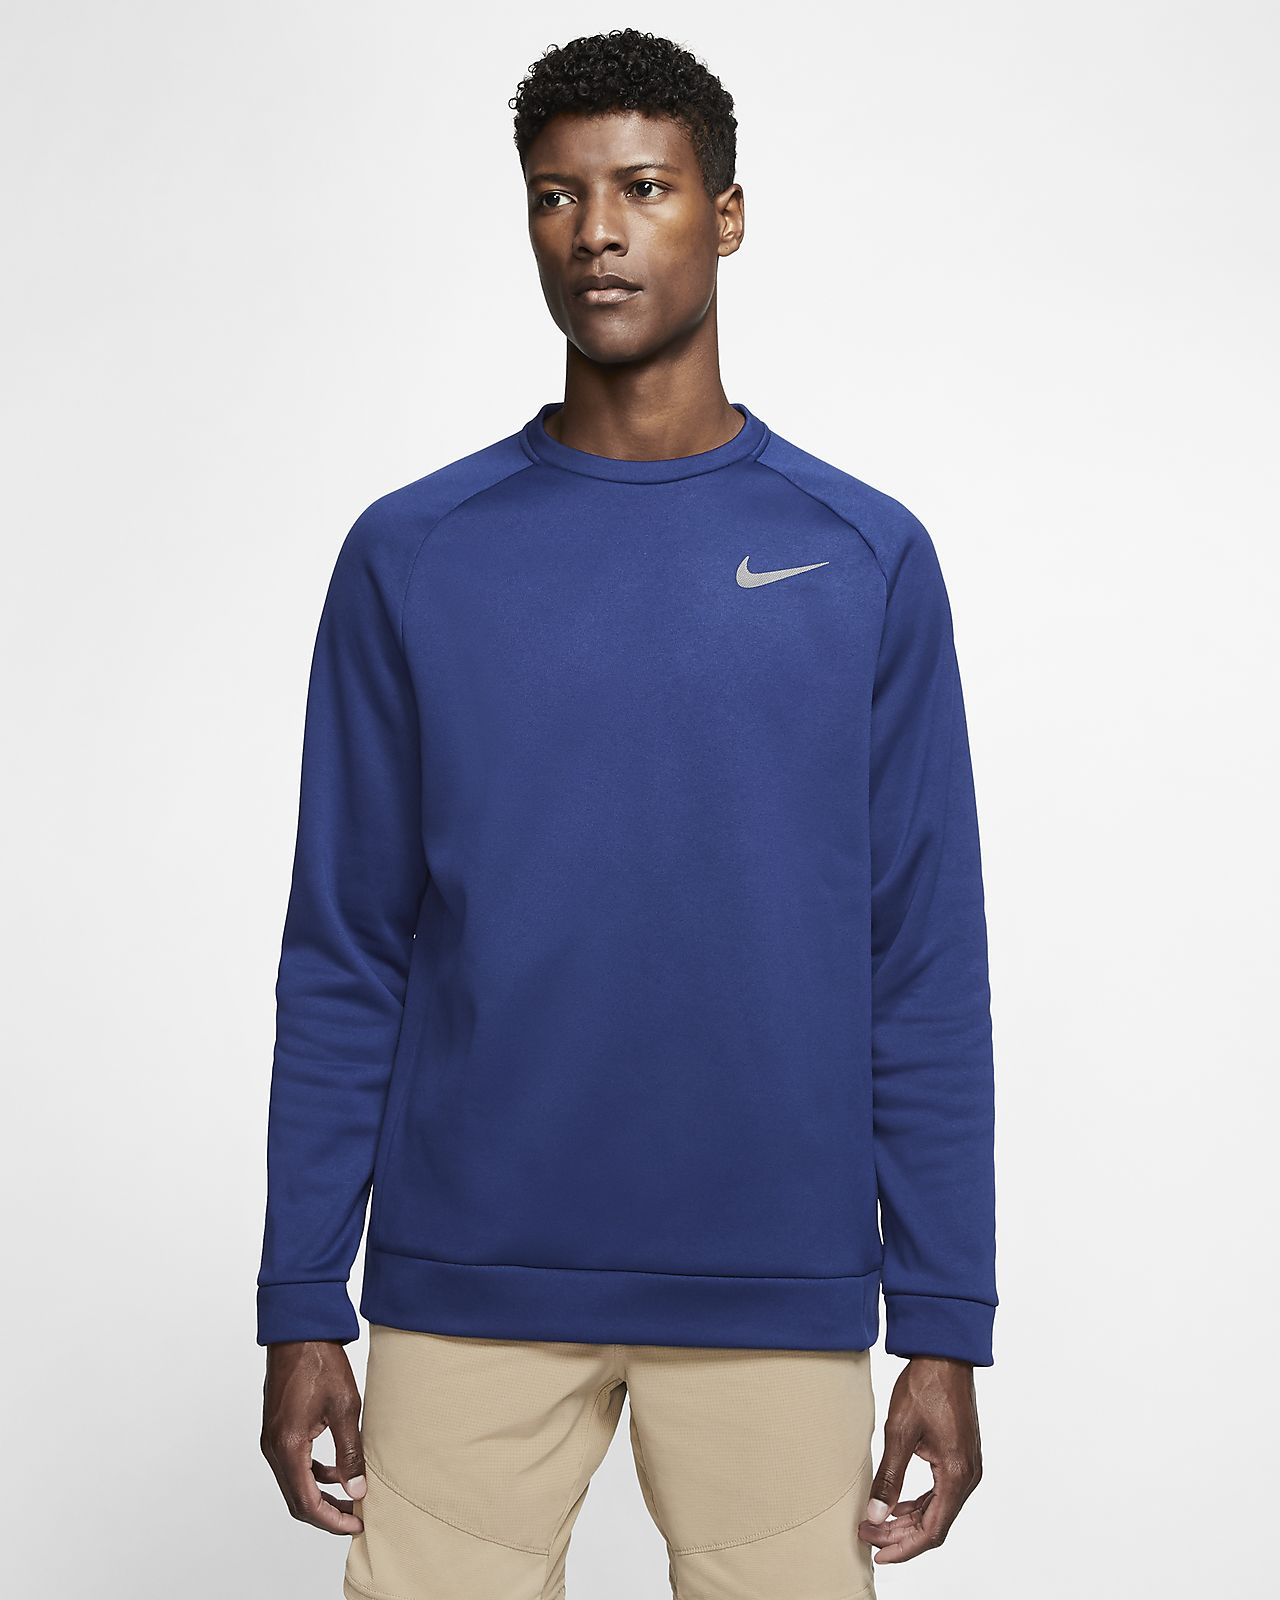 Nike Therma Trainingstop voor heren